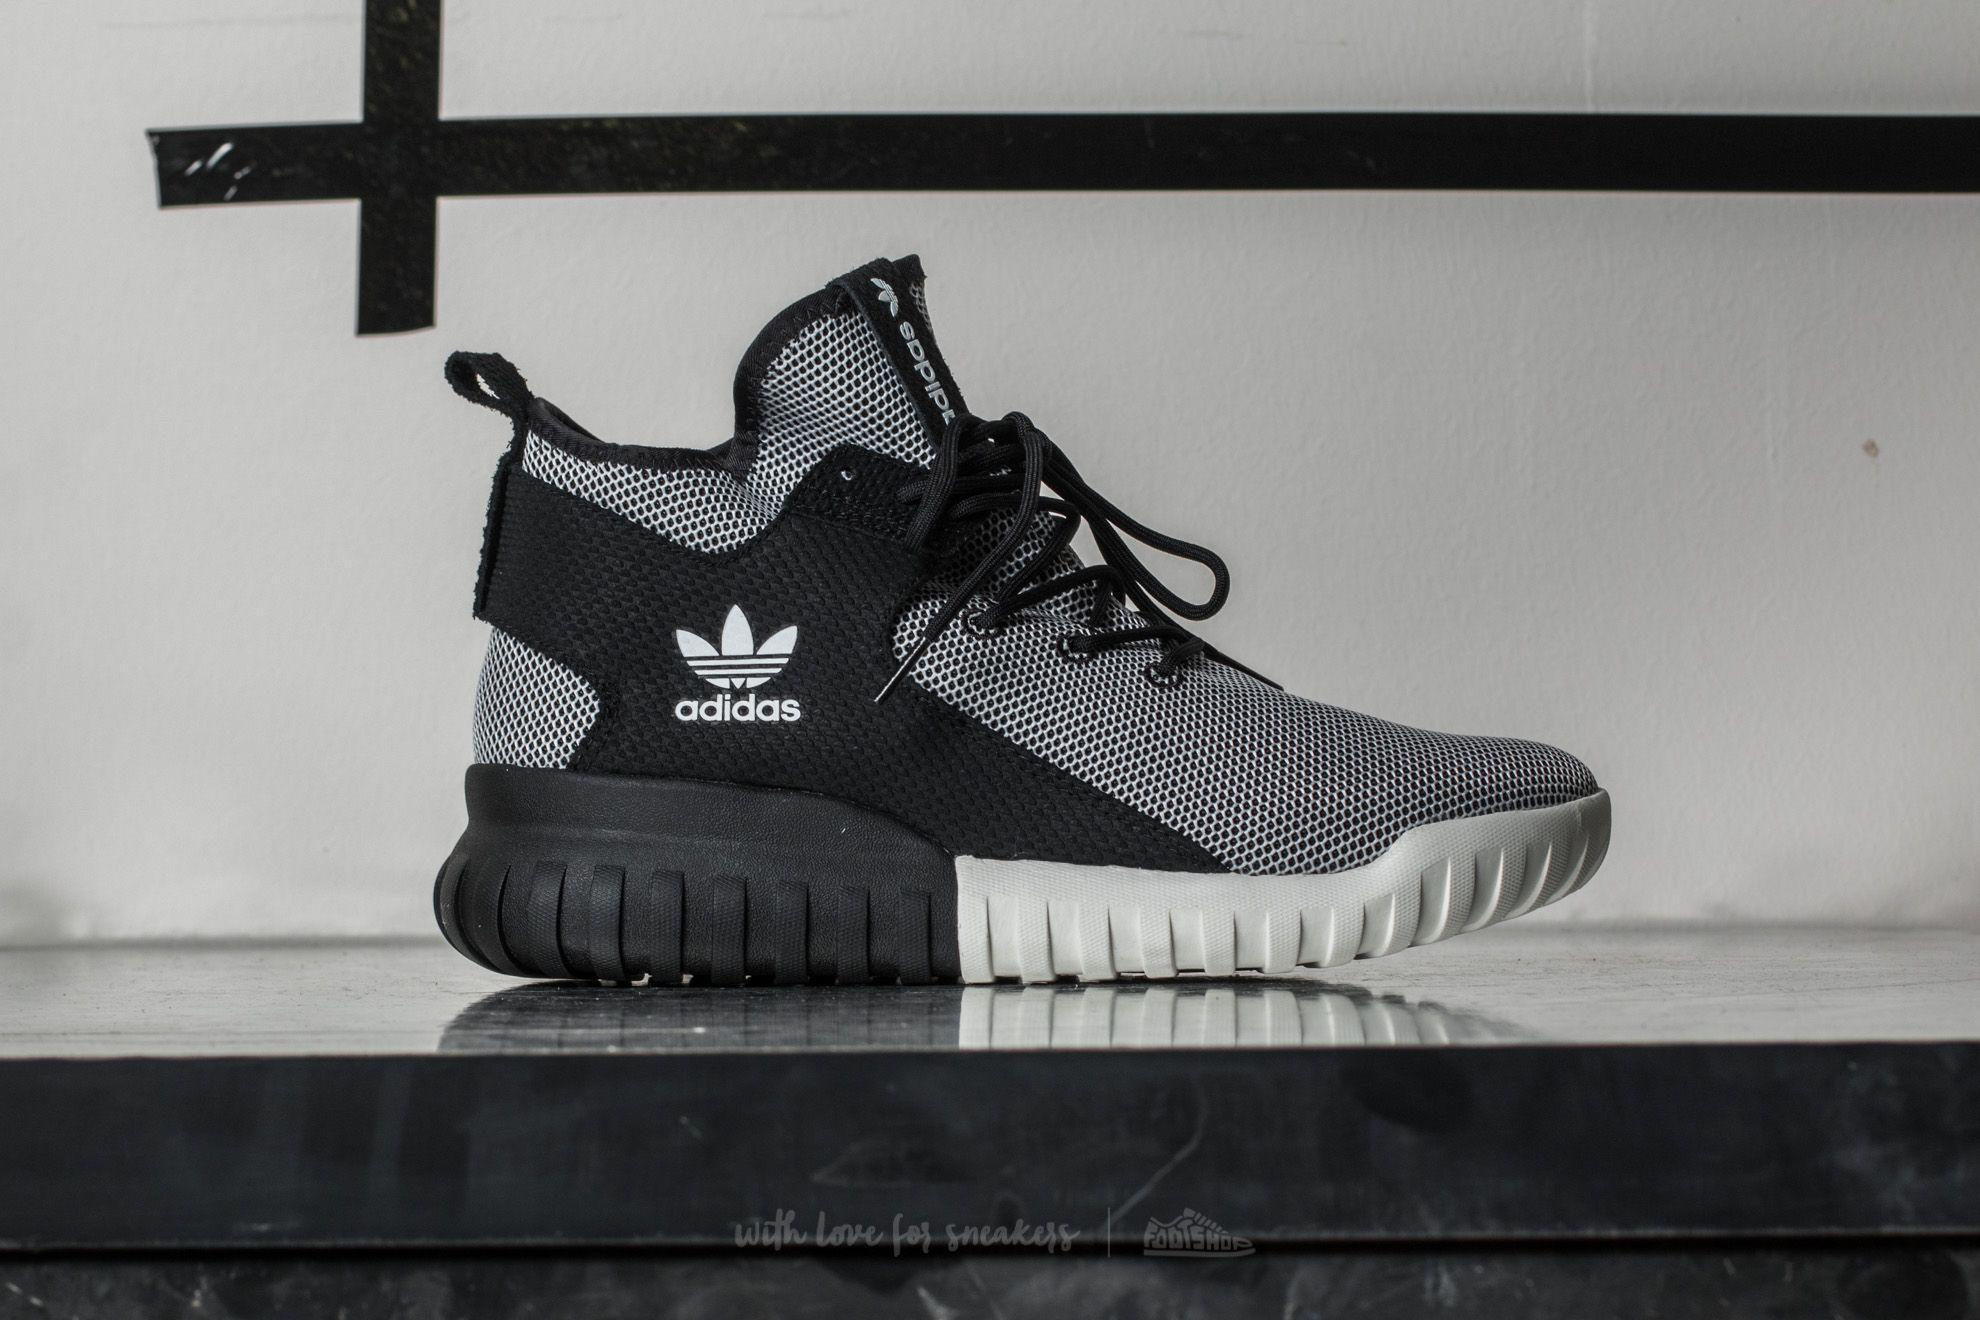 41c5c570b59 Lyst - adidas Originals Adidas Tubular X Core Black  Core Black ...